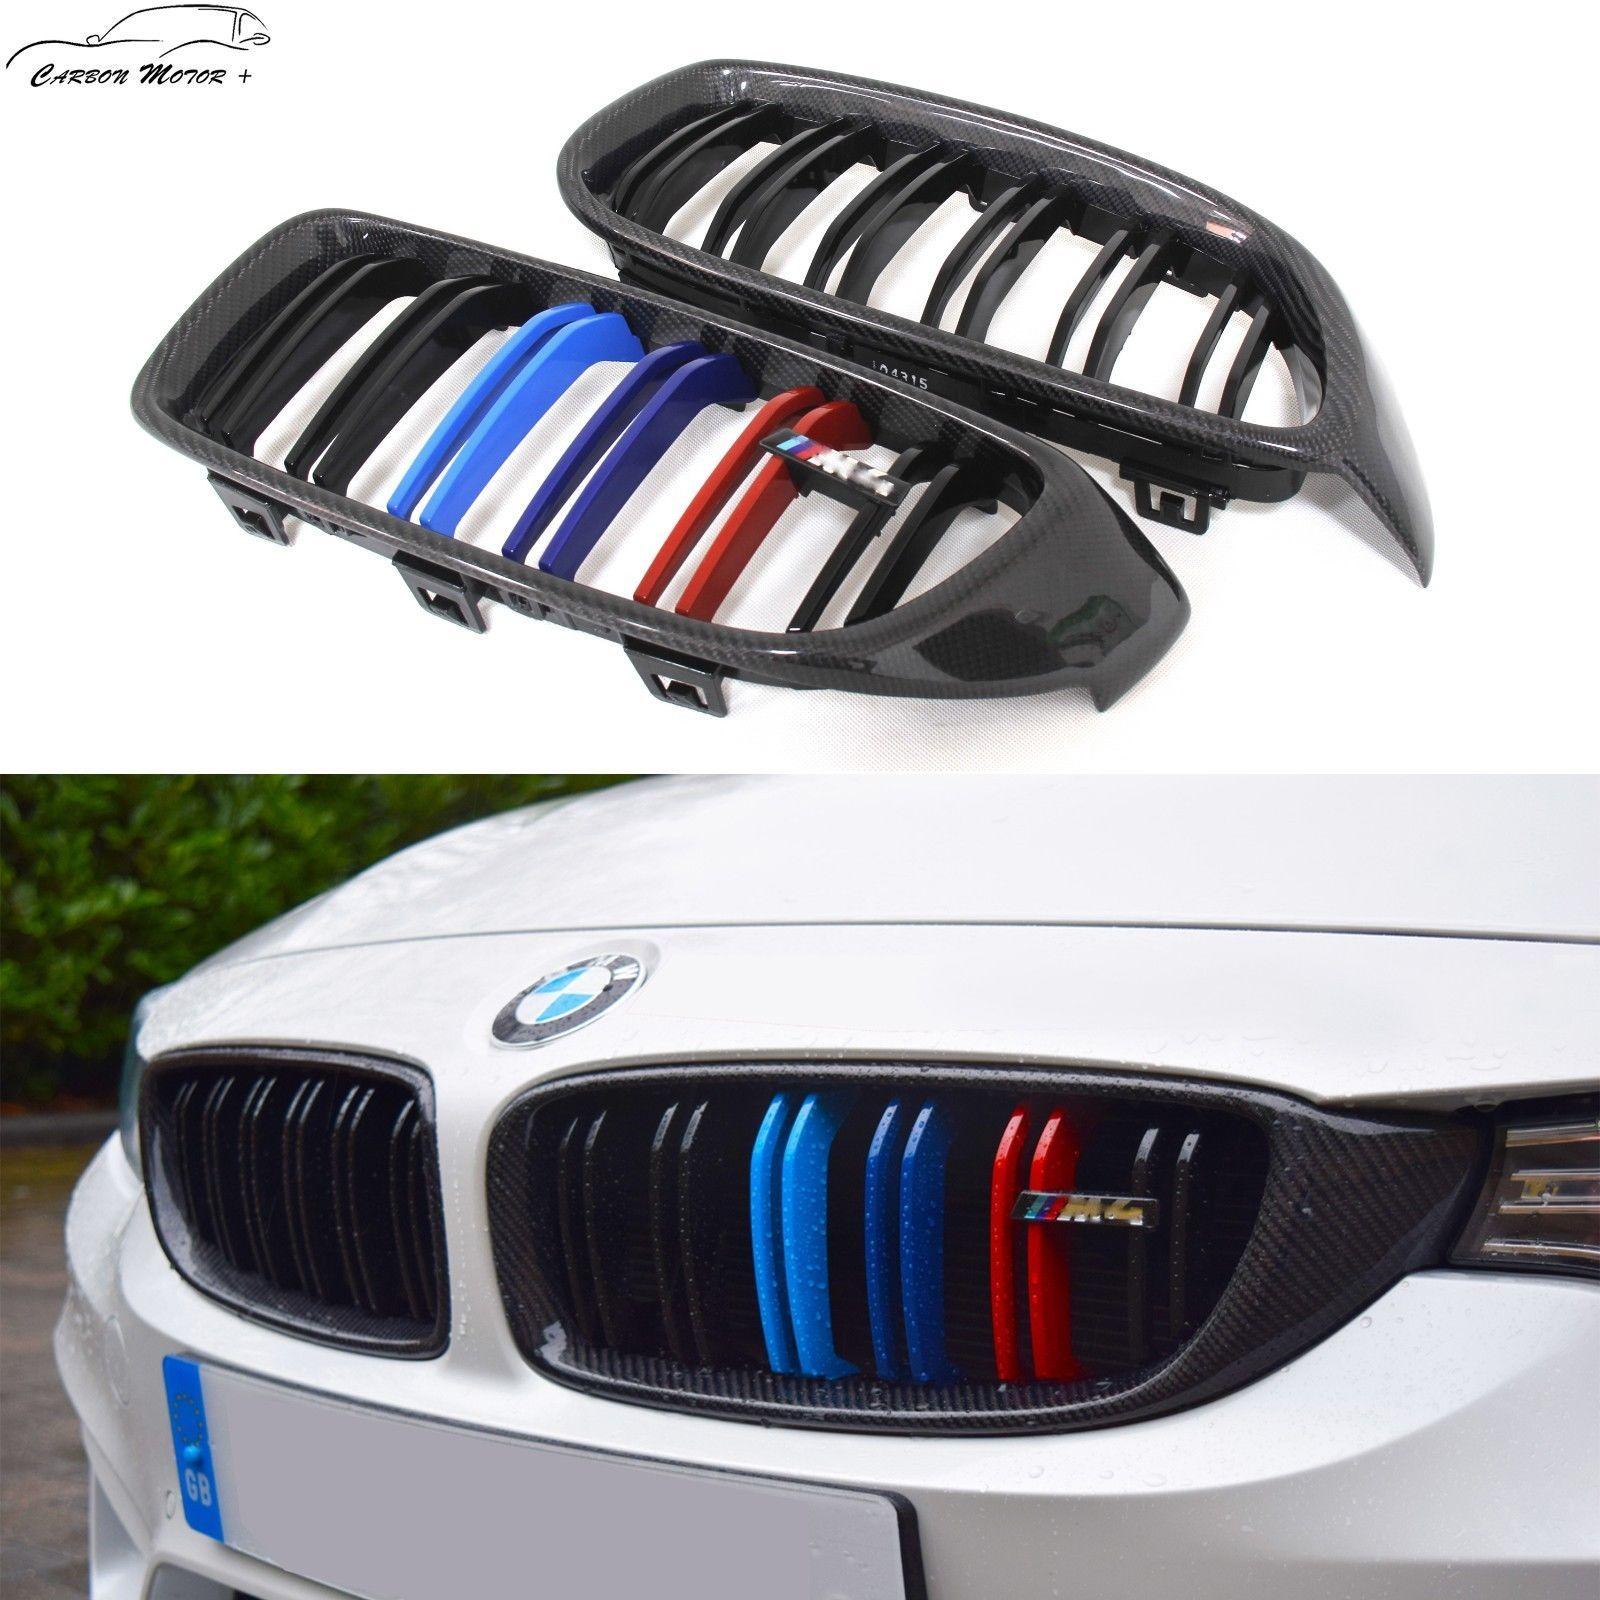 Stick on Type For BMW F32 F33 F36 M4 Carbon Fiber Fender Side Grille Cover